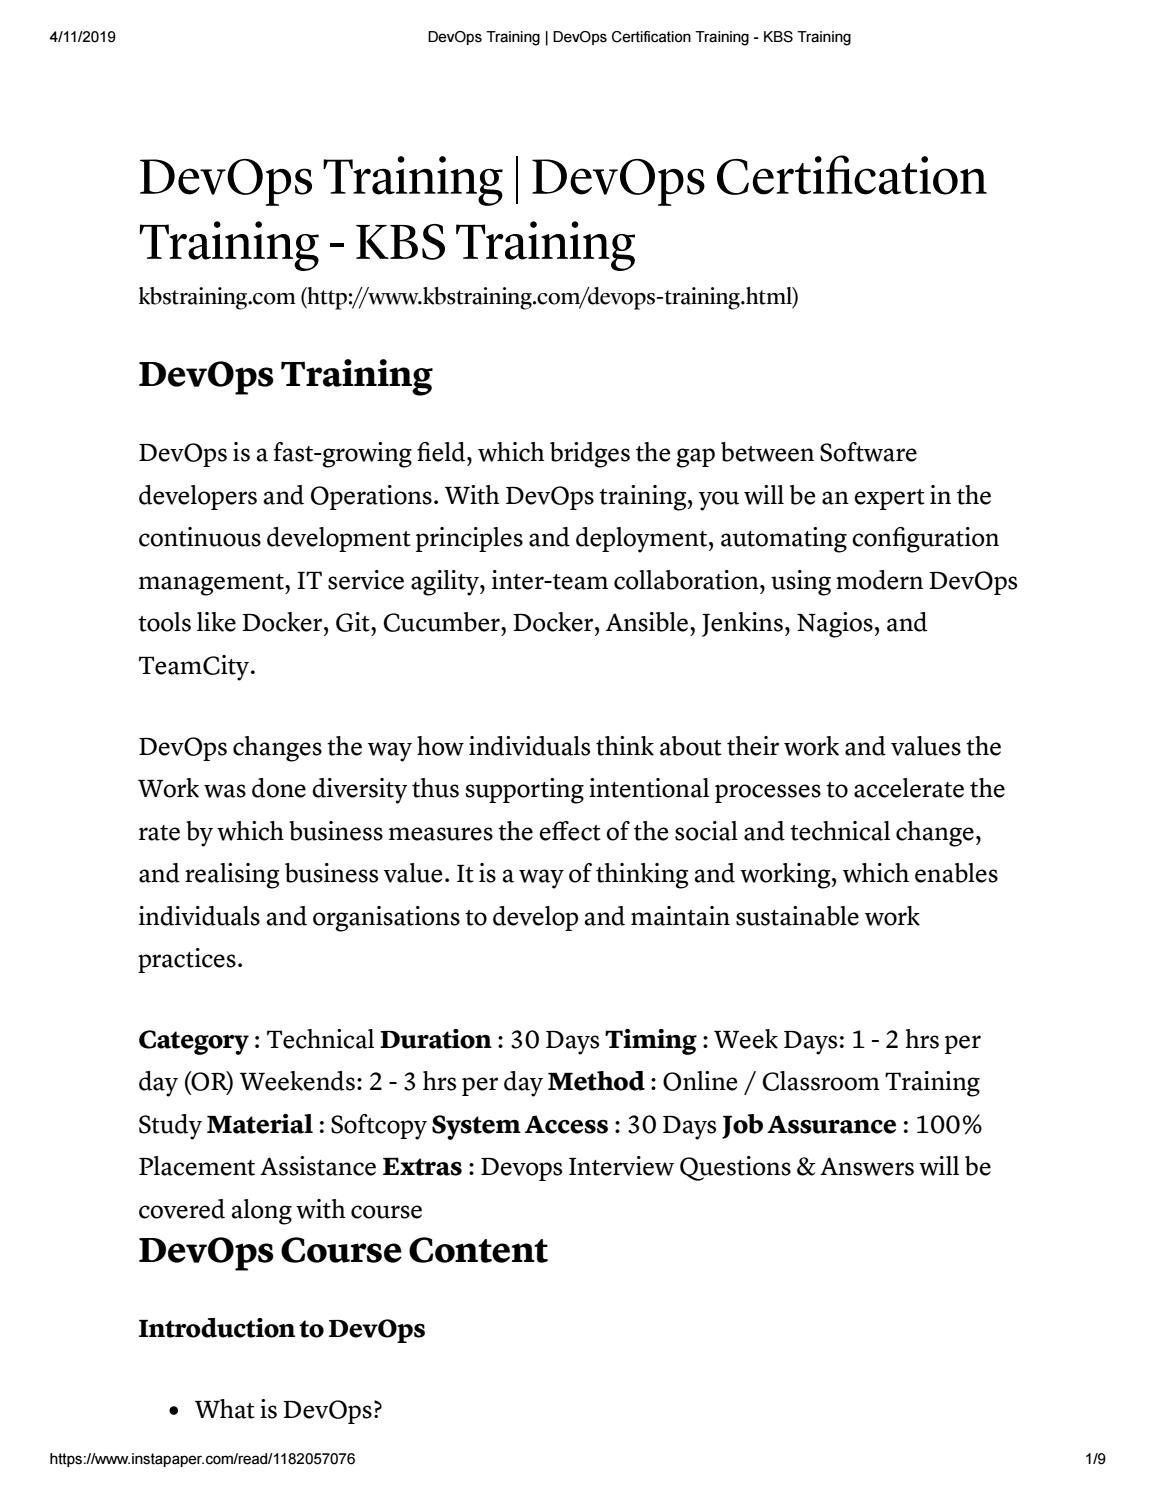 Devops Online Training at KBS Training by smileyswetha2 - issuu